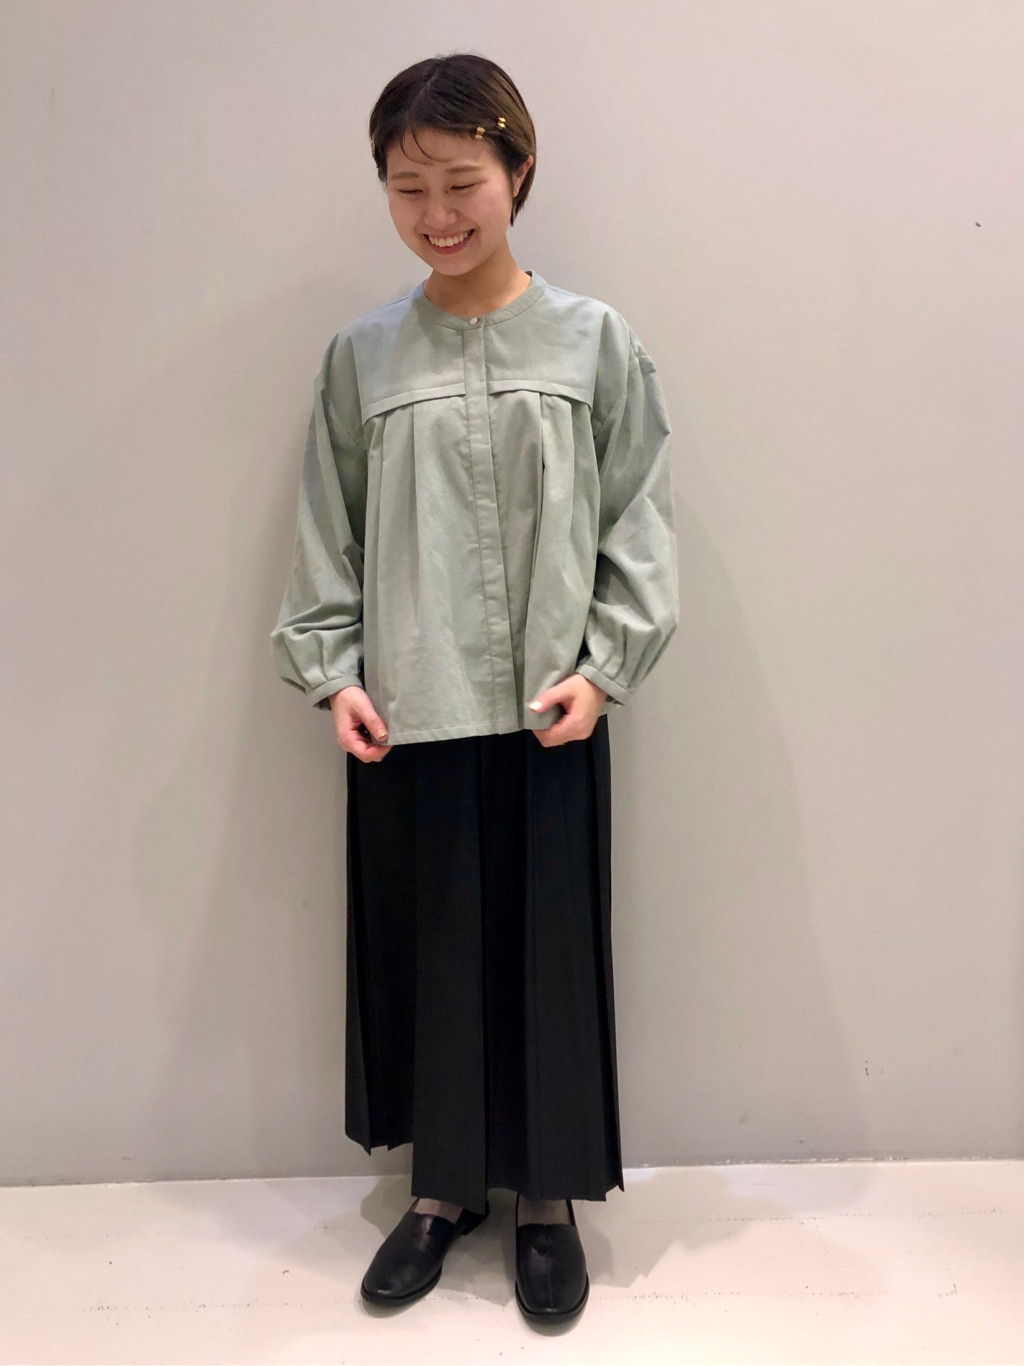 bulle de savon なんばシティ 身長:149cm 2020.11.14